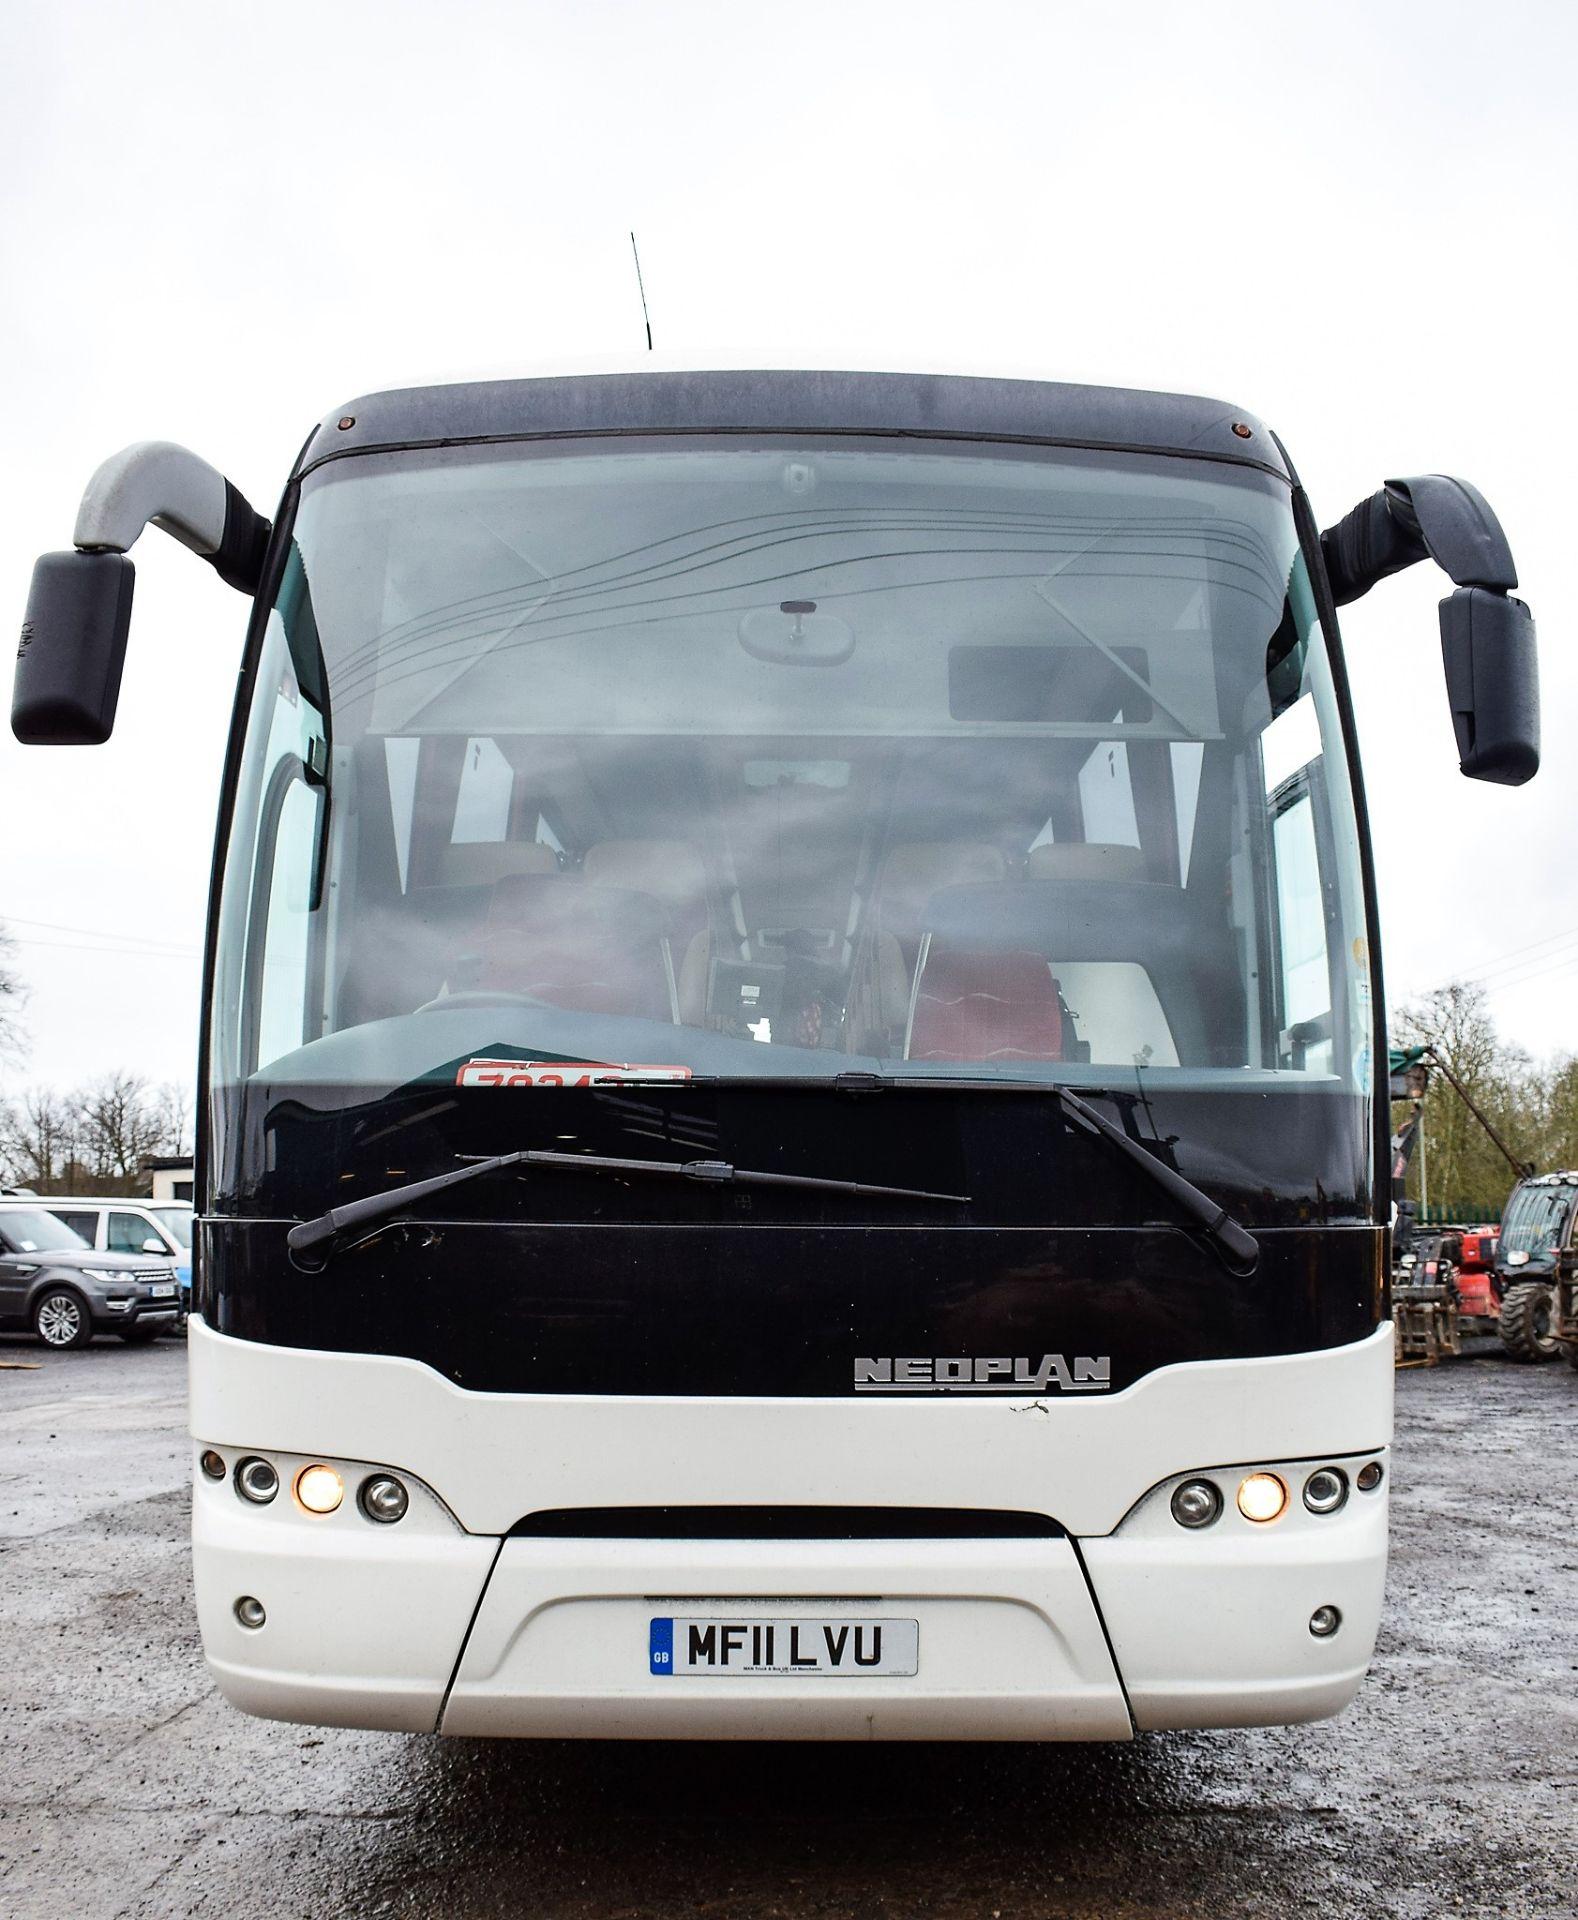 Lot 16A - Neoplan Tourliner 61 seat luxury coach Registration Number: MF11 LVU Date of Registration: 01/04/